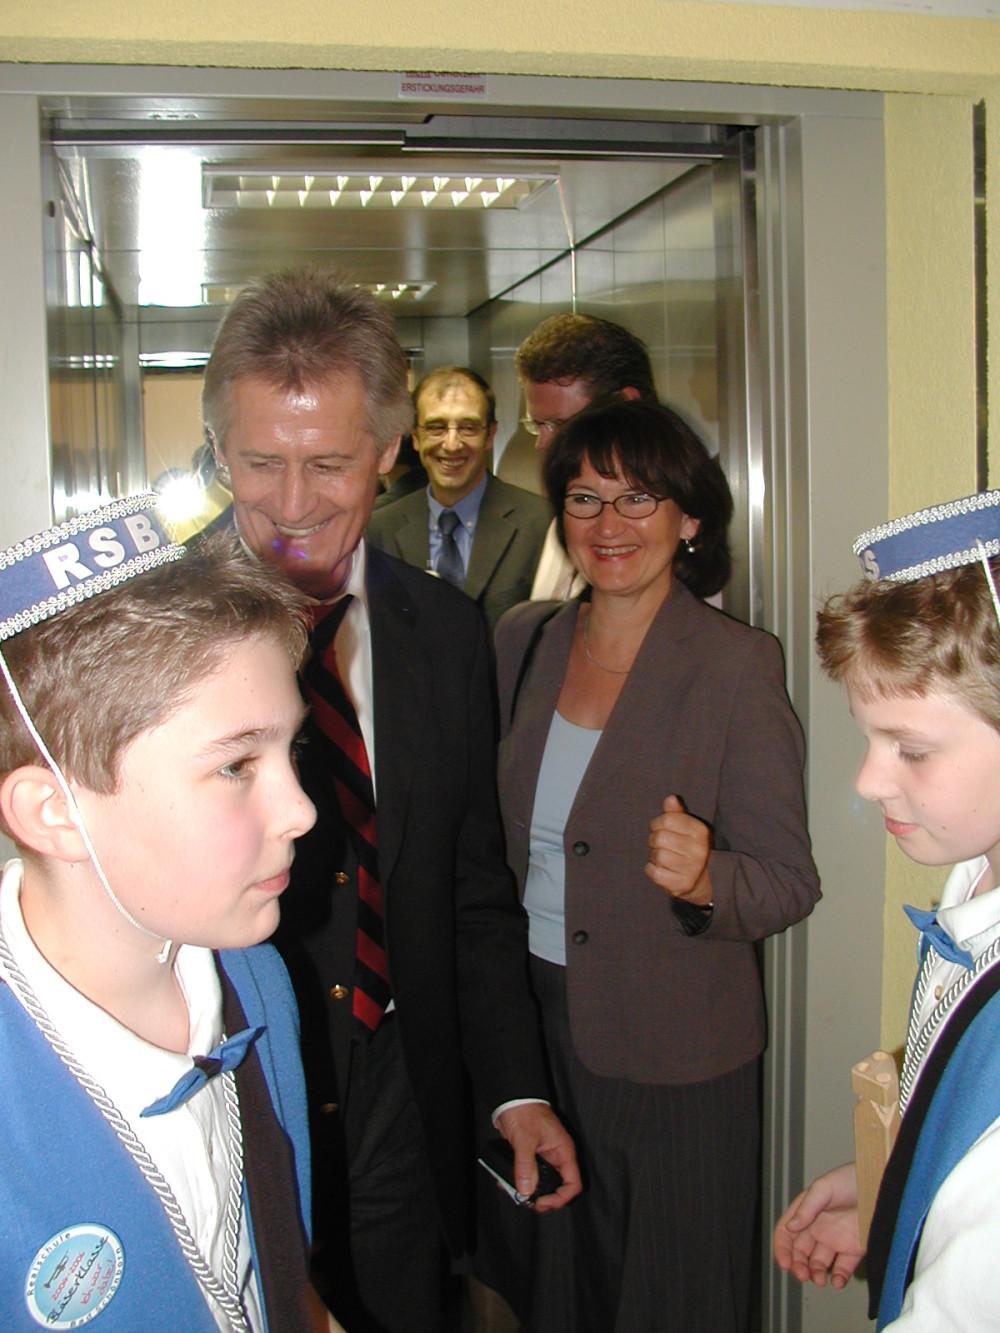 Realschule Lift barrierefrei Erste Fahrt Liftboys